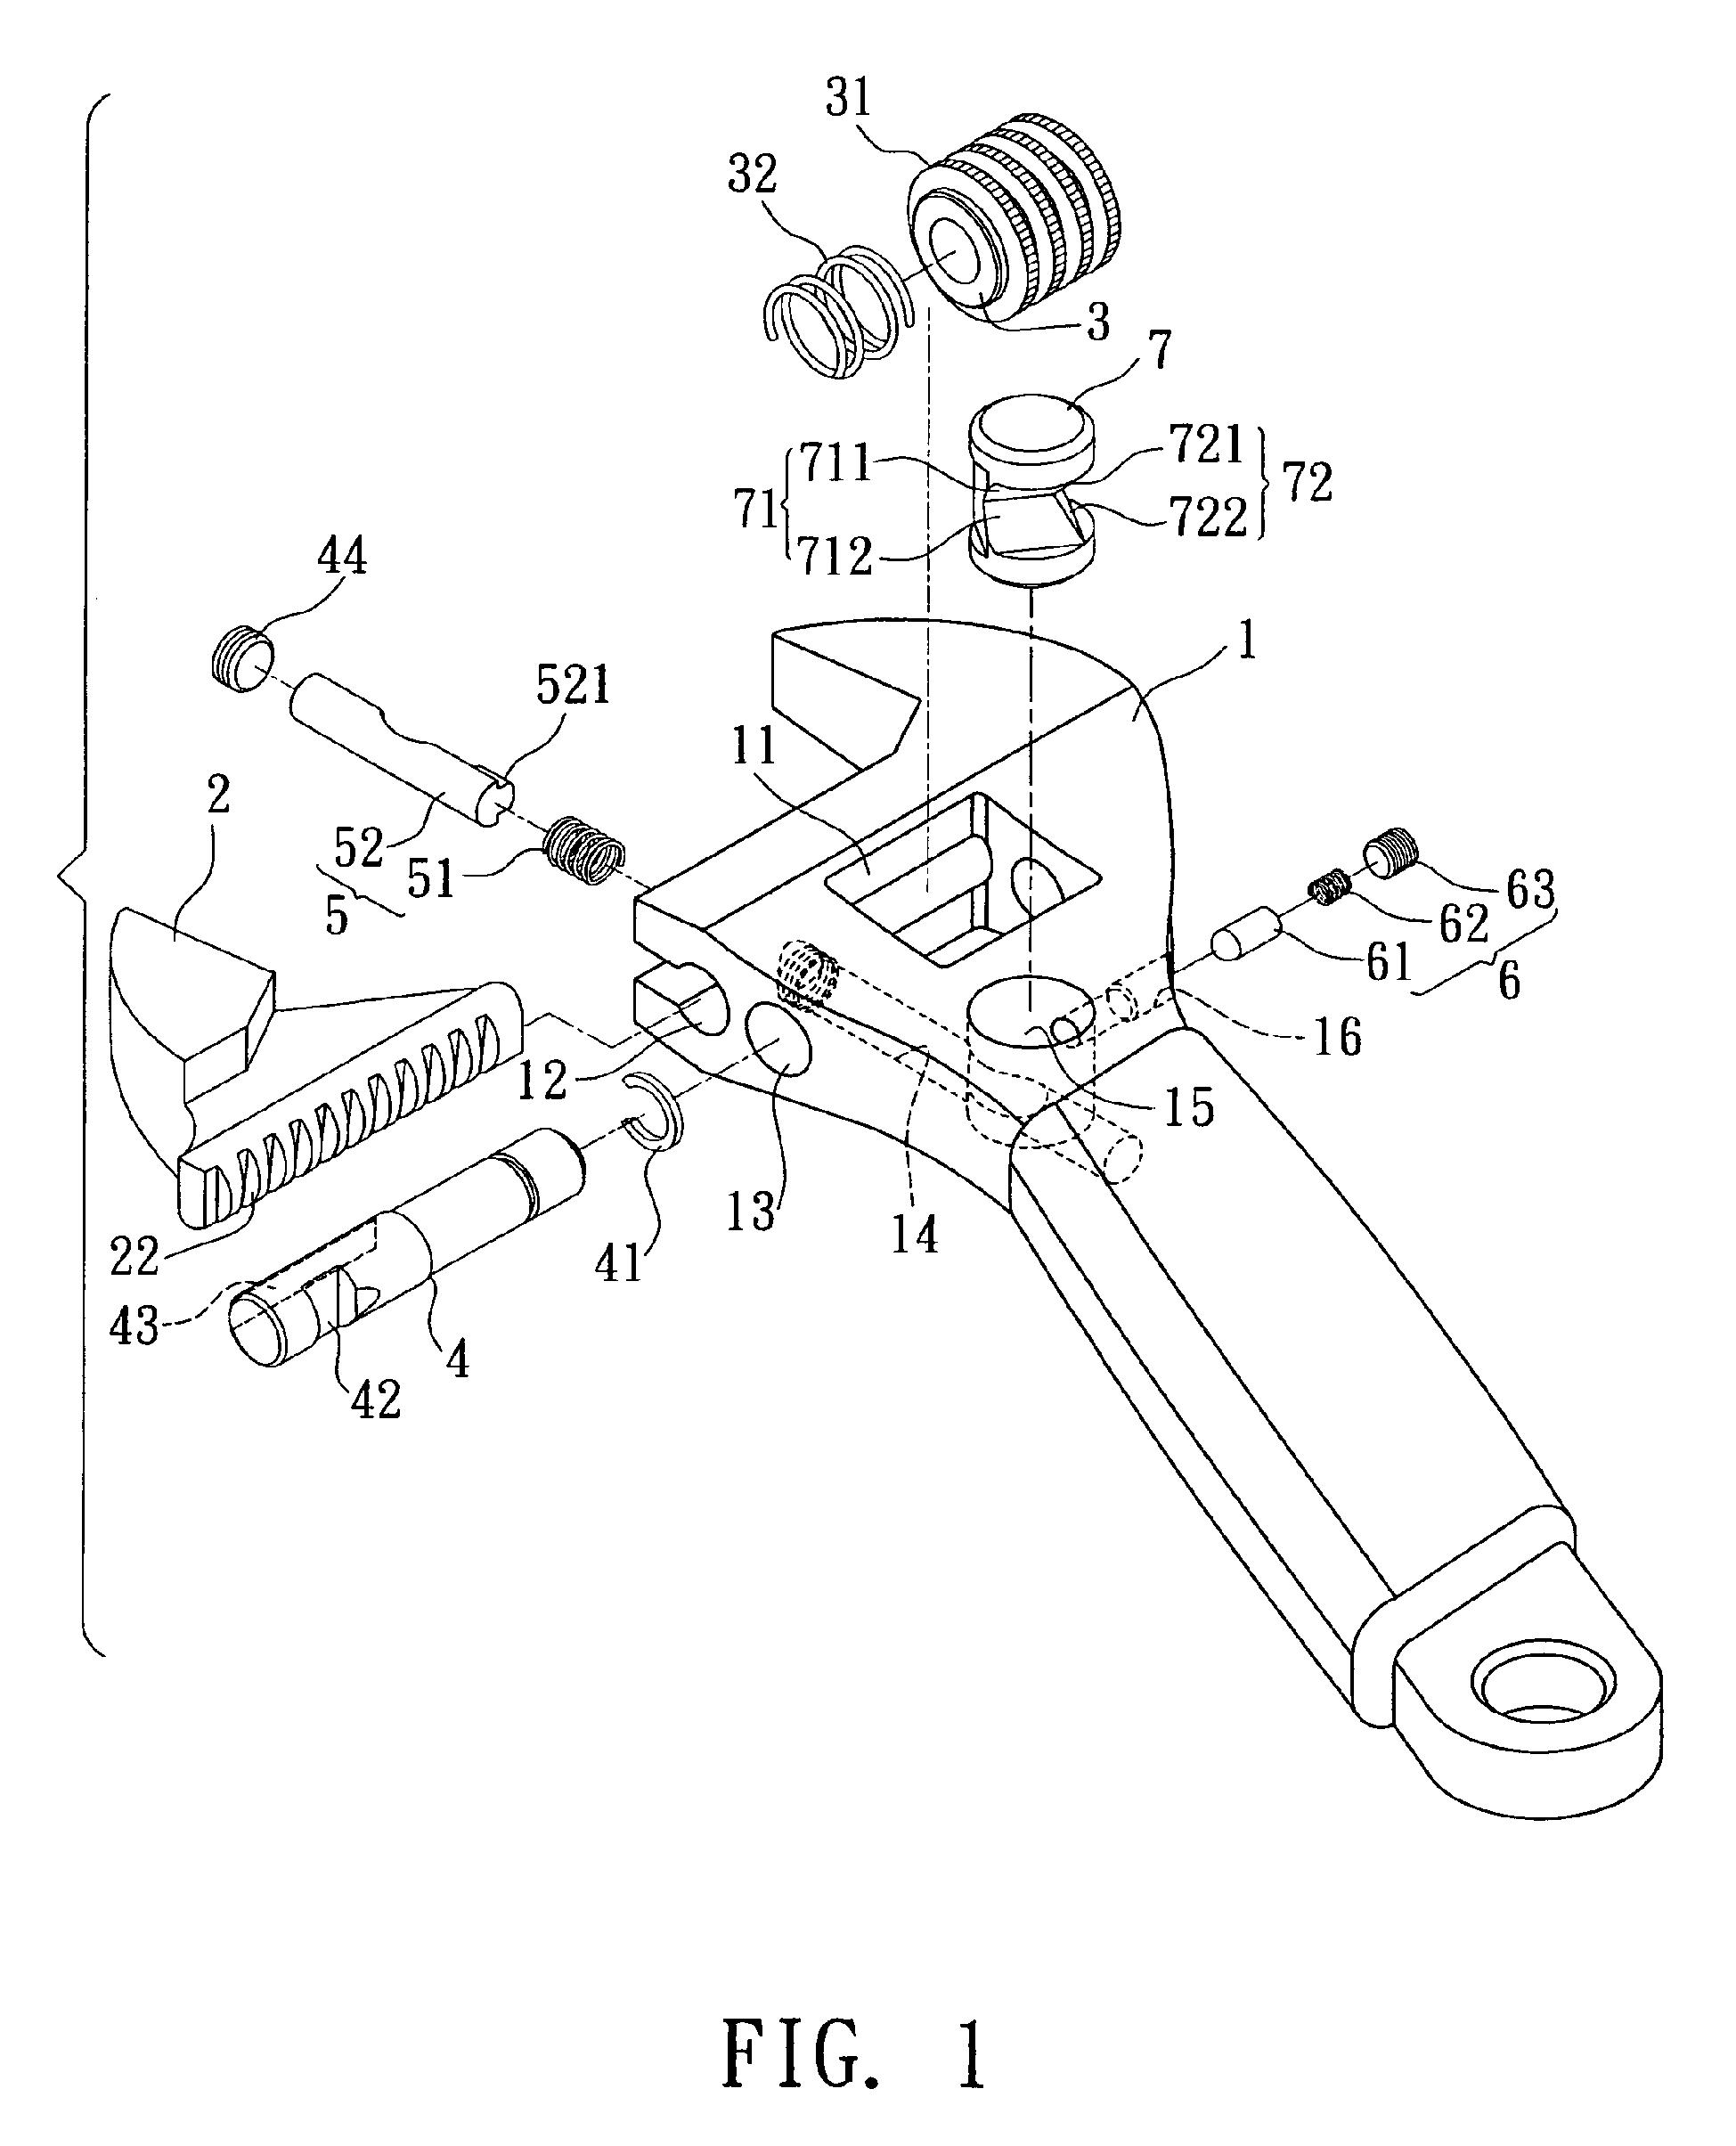 Adjustable Wrench June